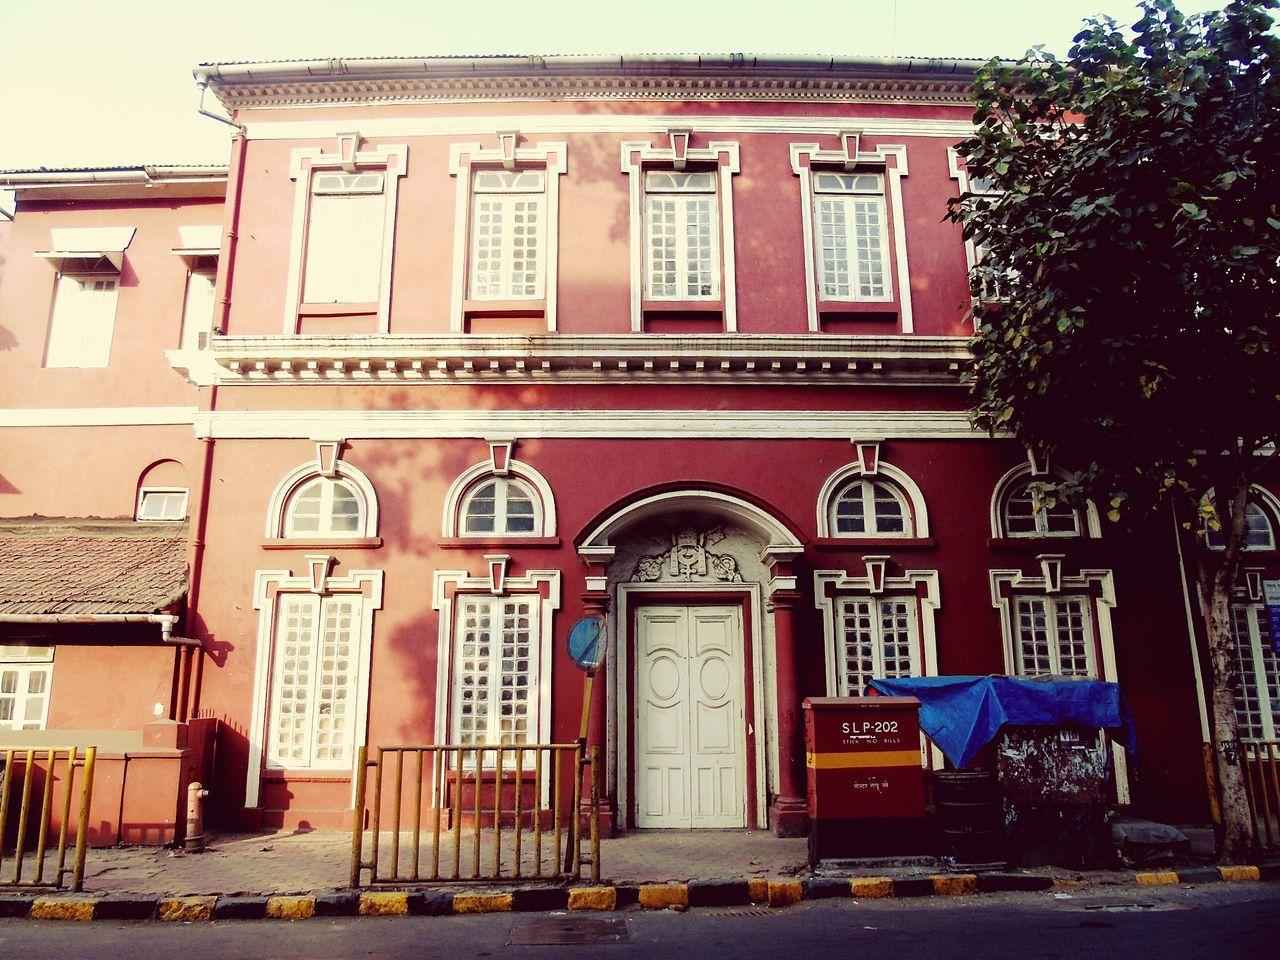 Architecture City MumbaiDiaries Photographic Memory Cityscape Heritagebuilding